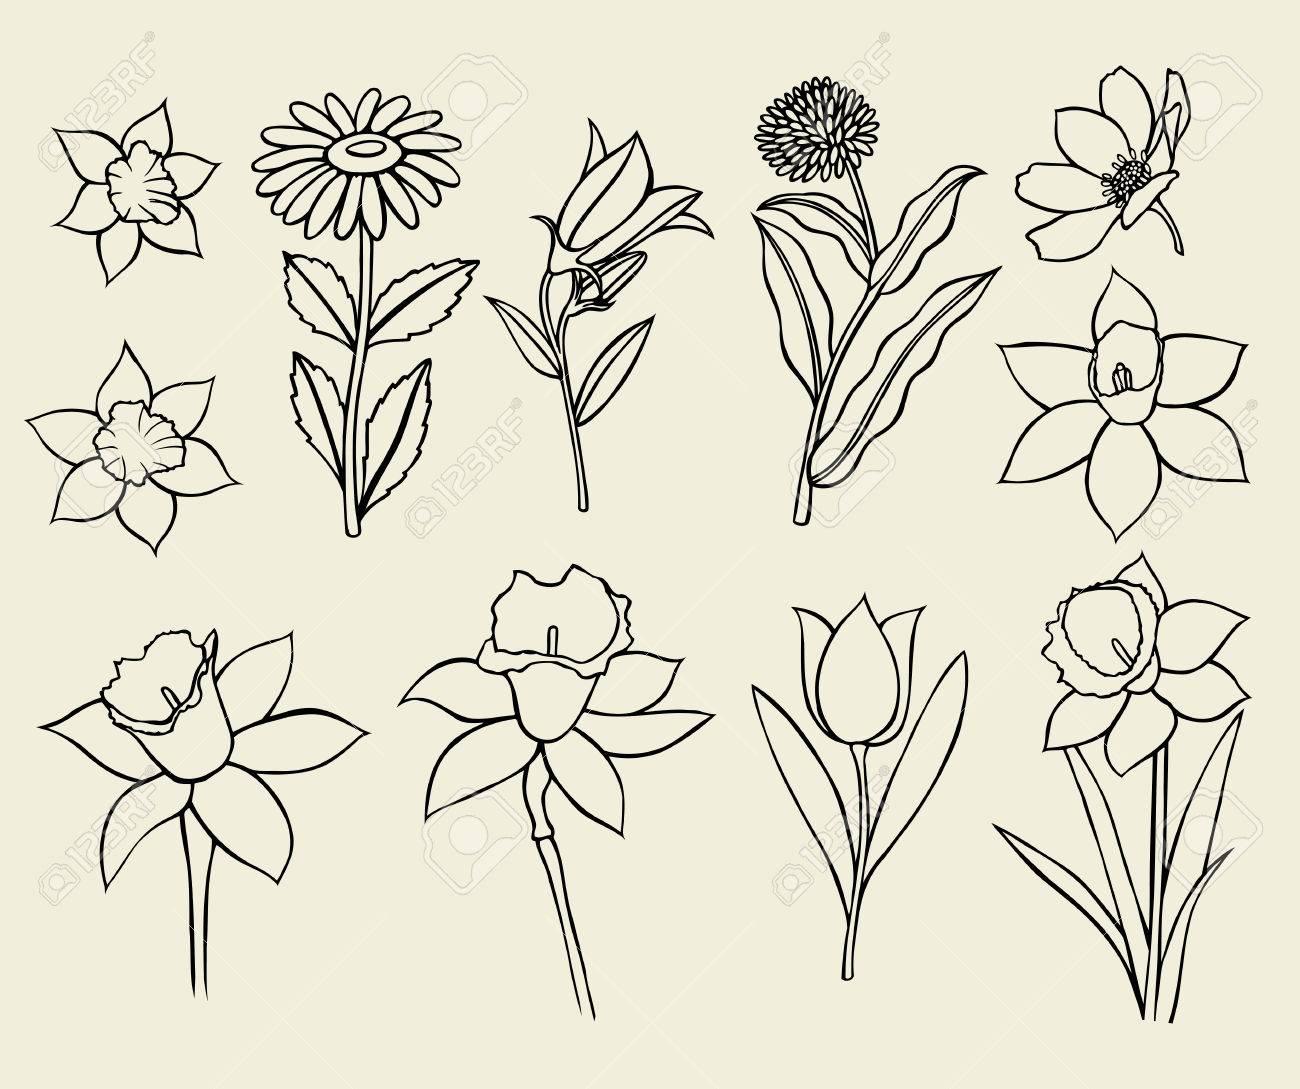 Conjunto De Flores Aisladas Sobre Fondo Blanco, Dibujo Botánico ...